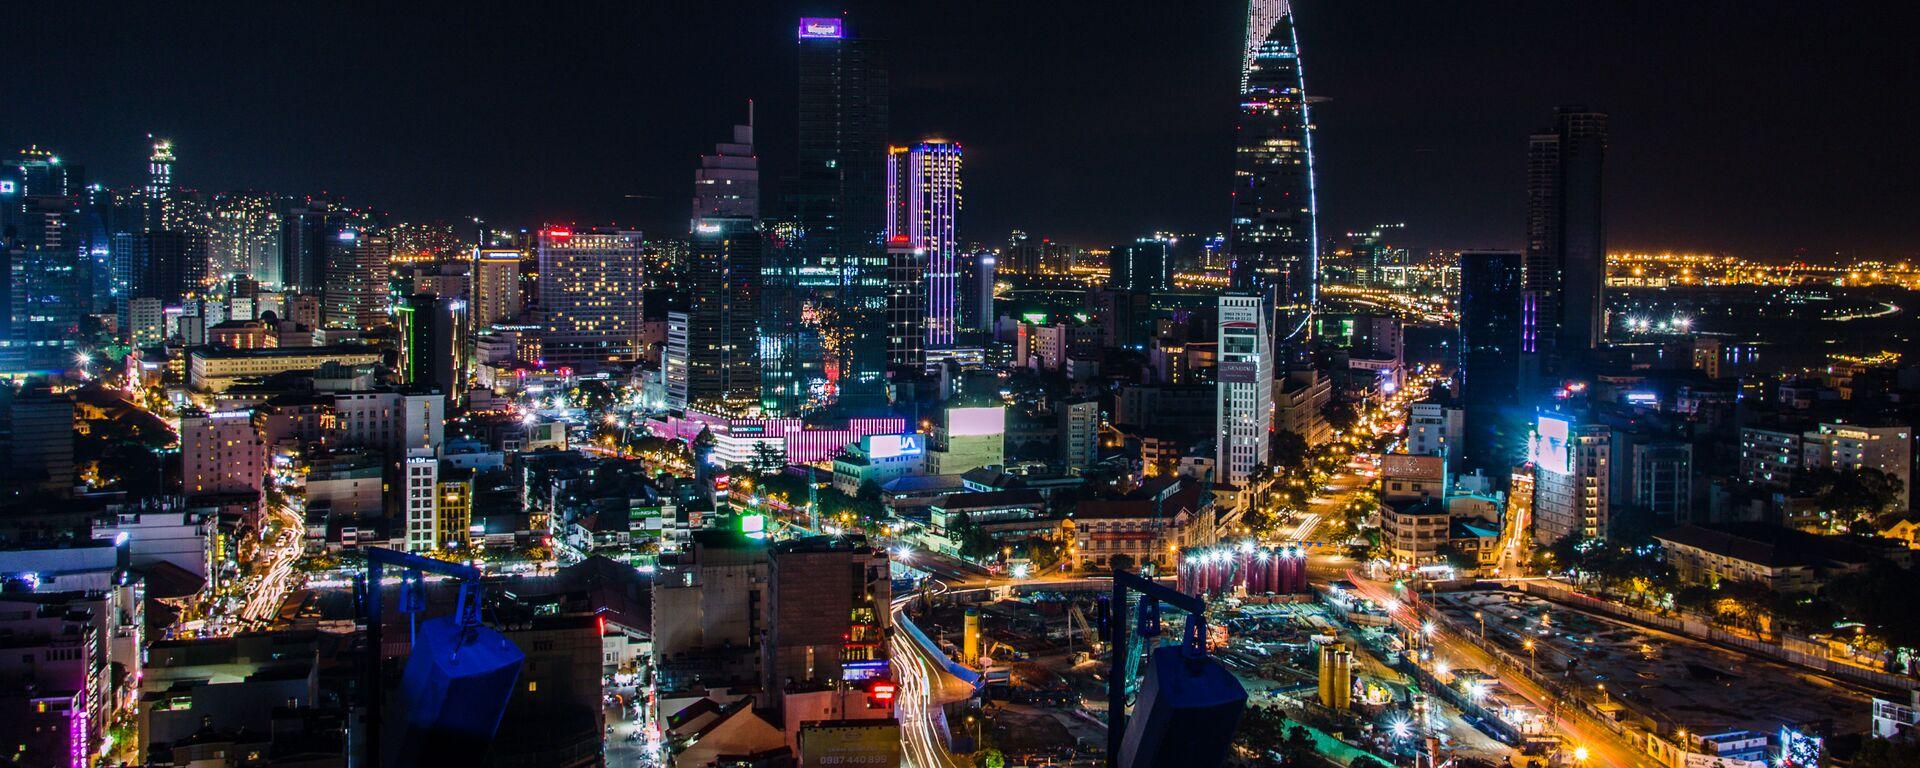 Thành phố Hồ Chí Minh - Sputnik Việt Nam, 1920, 14.10.2020